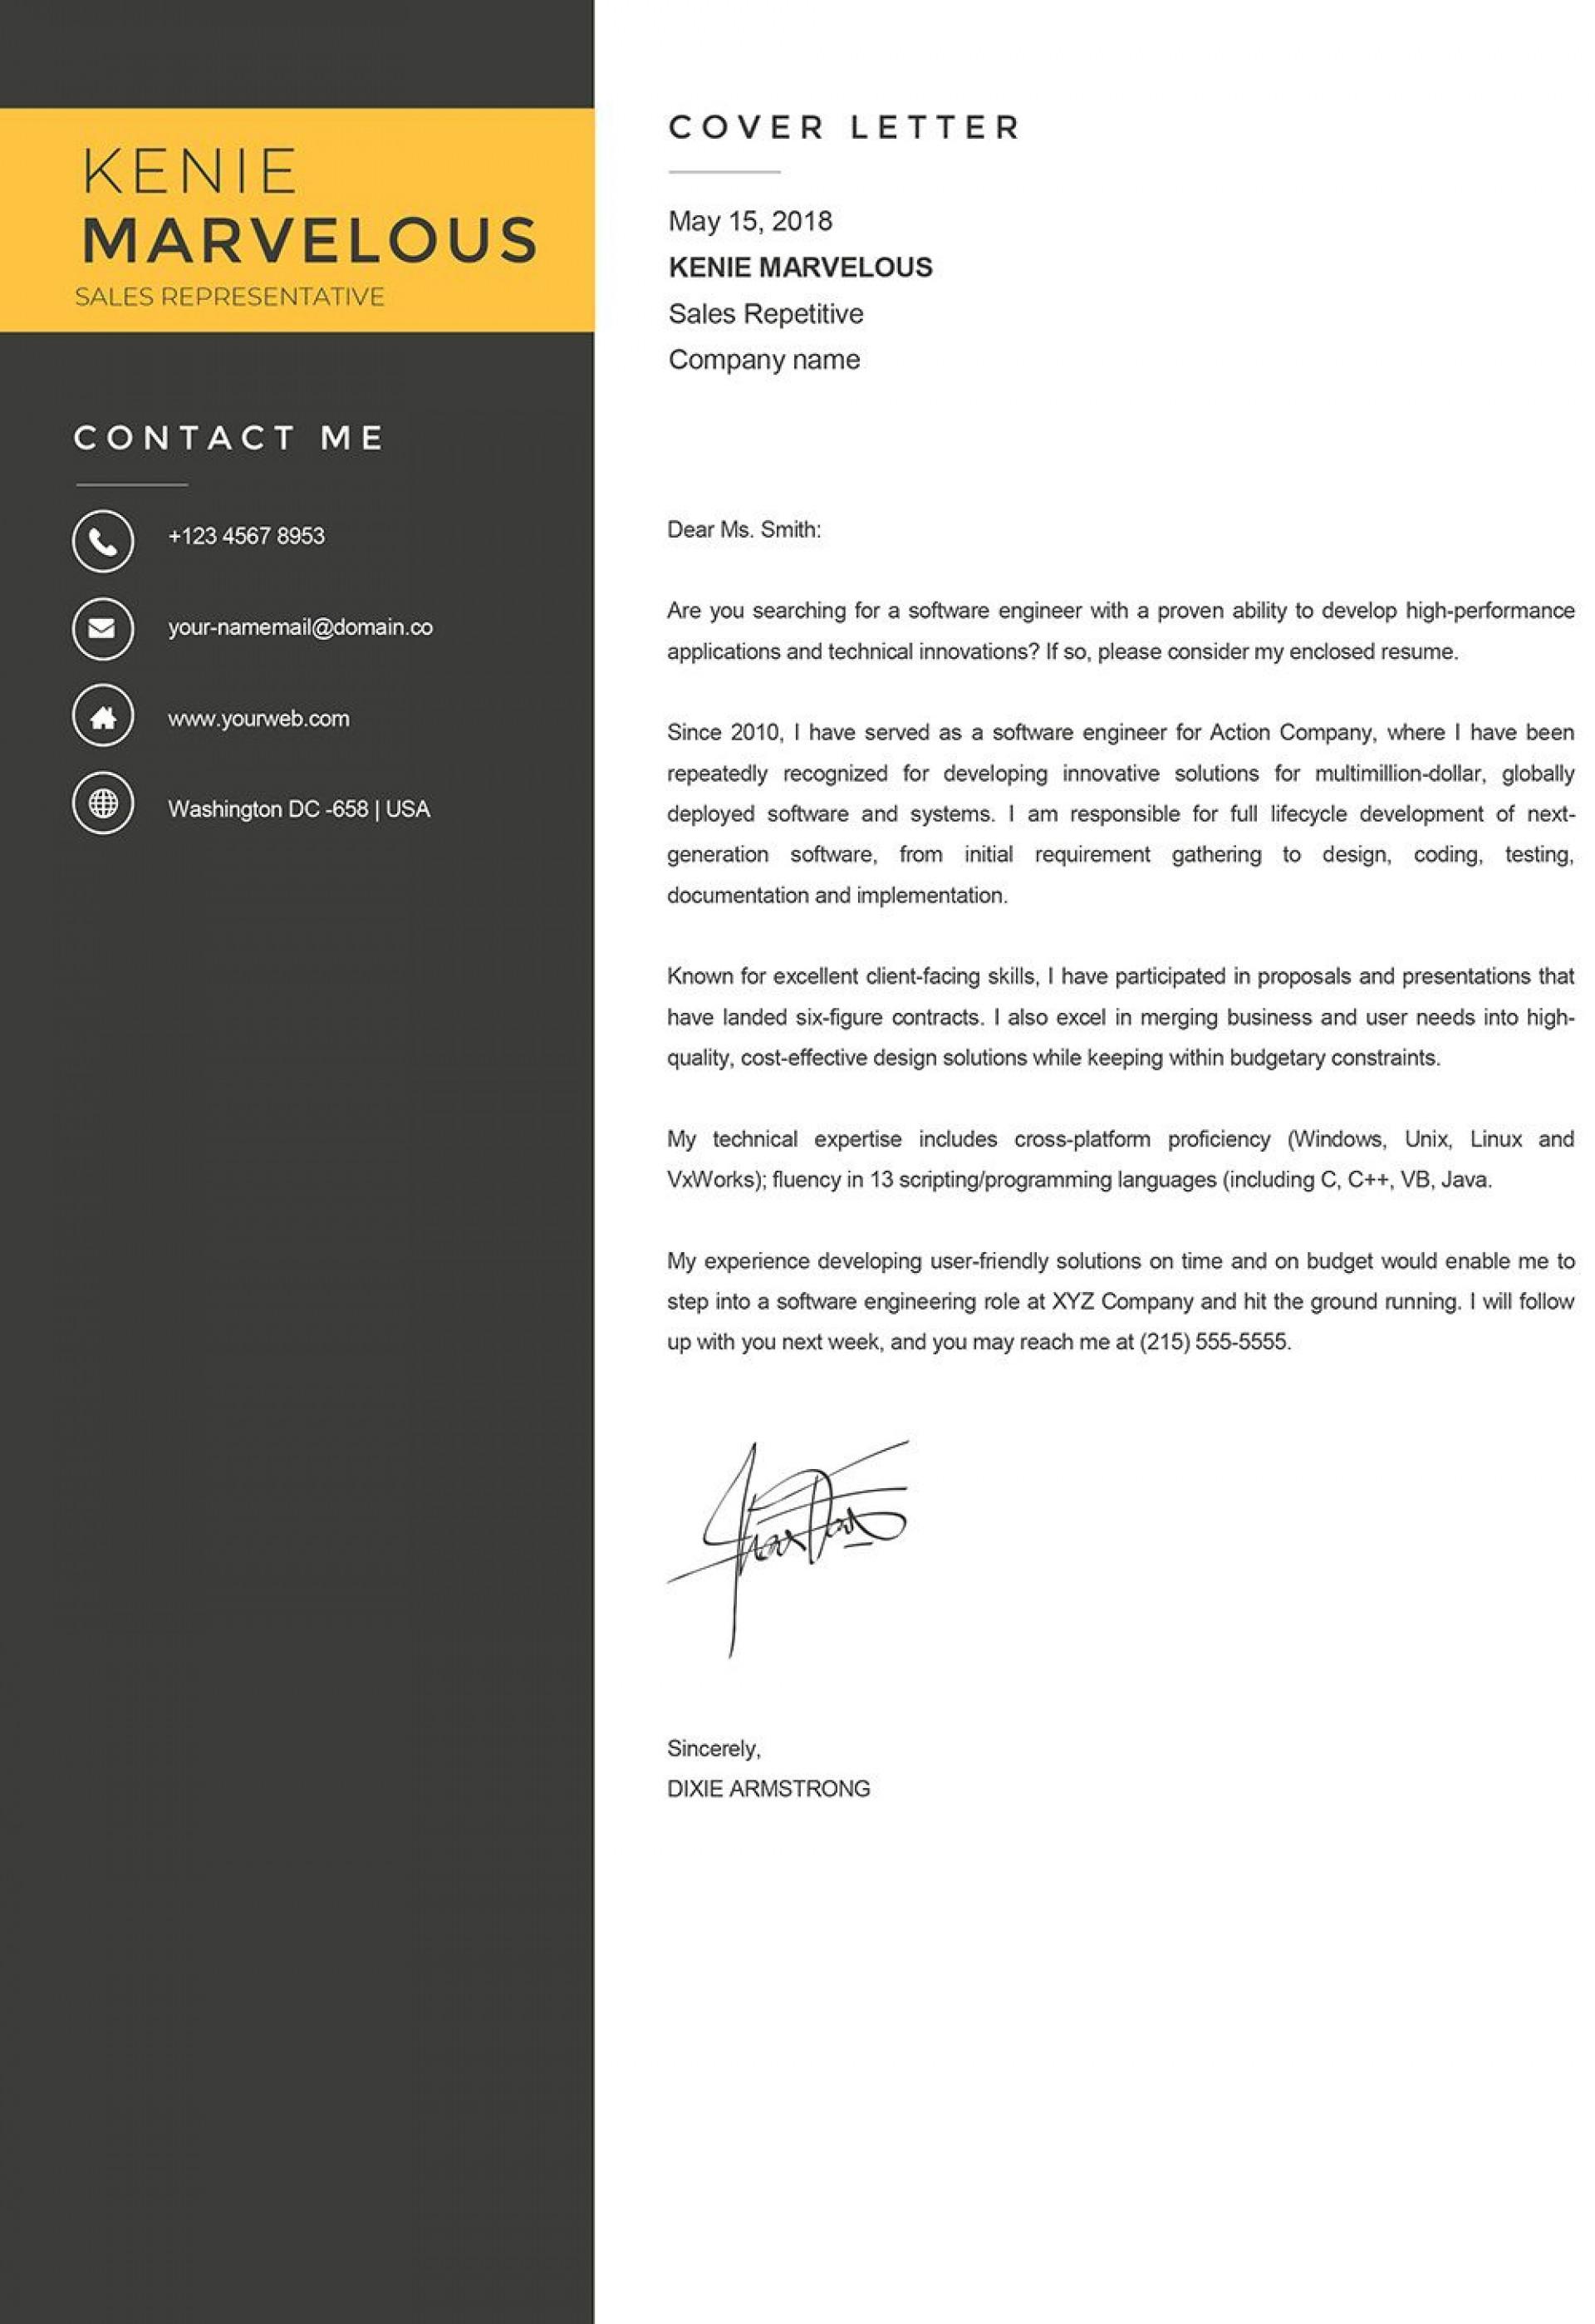 008 Best Cover Letter Sample Template Word Idea  Resume Microsoft1920